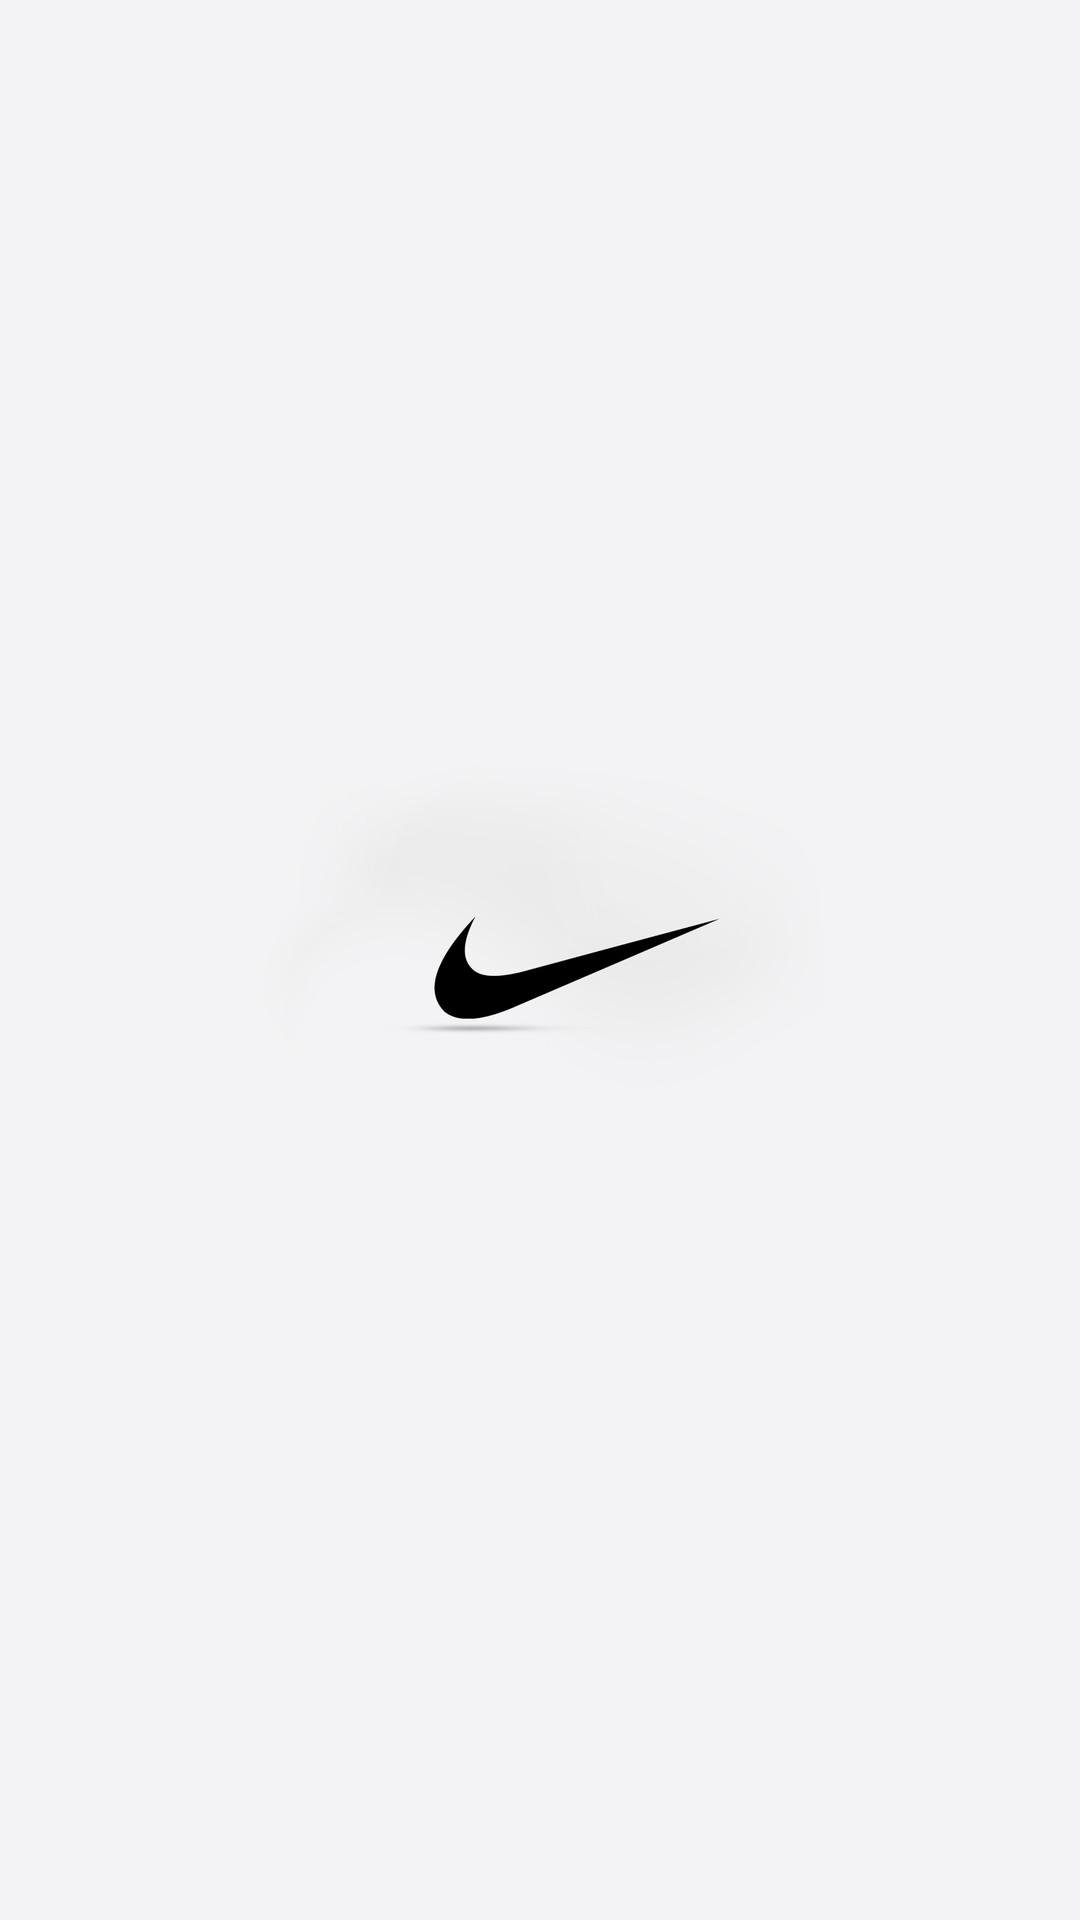 Logo Wallpaper Nike photos of Nike iPhone Wallpaper: Here we have .